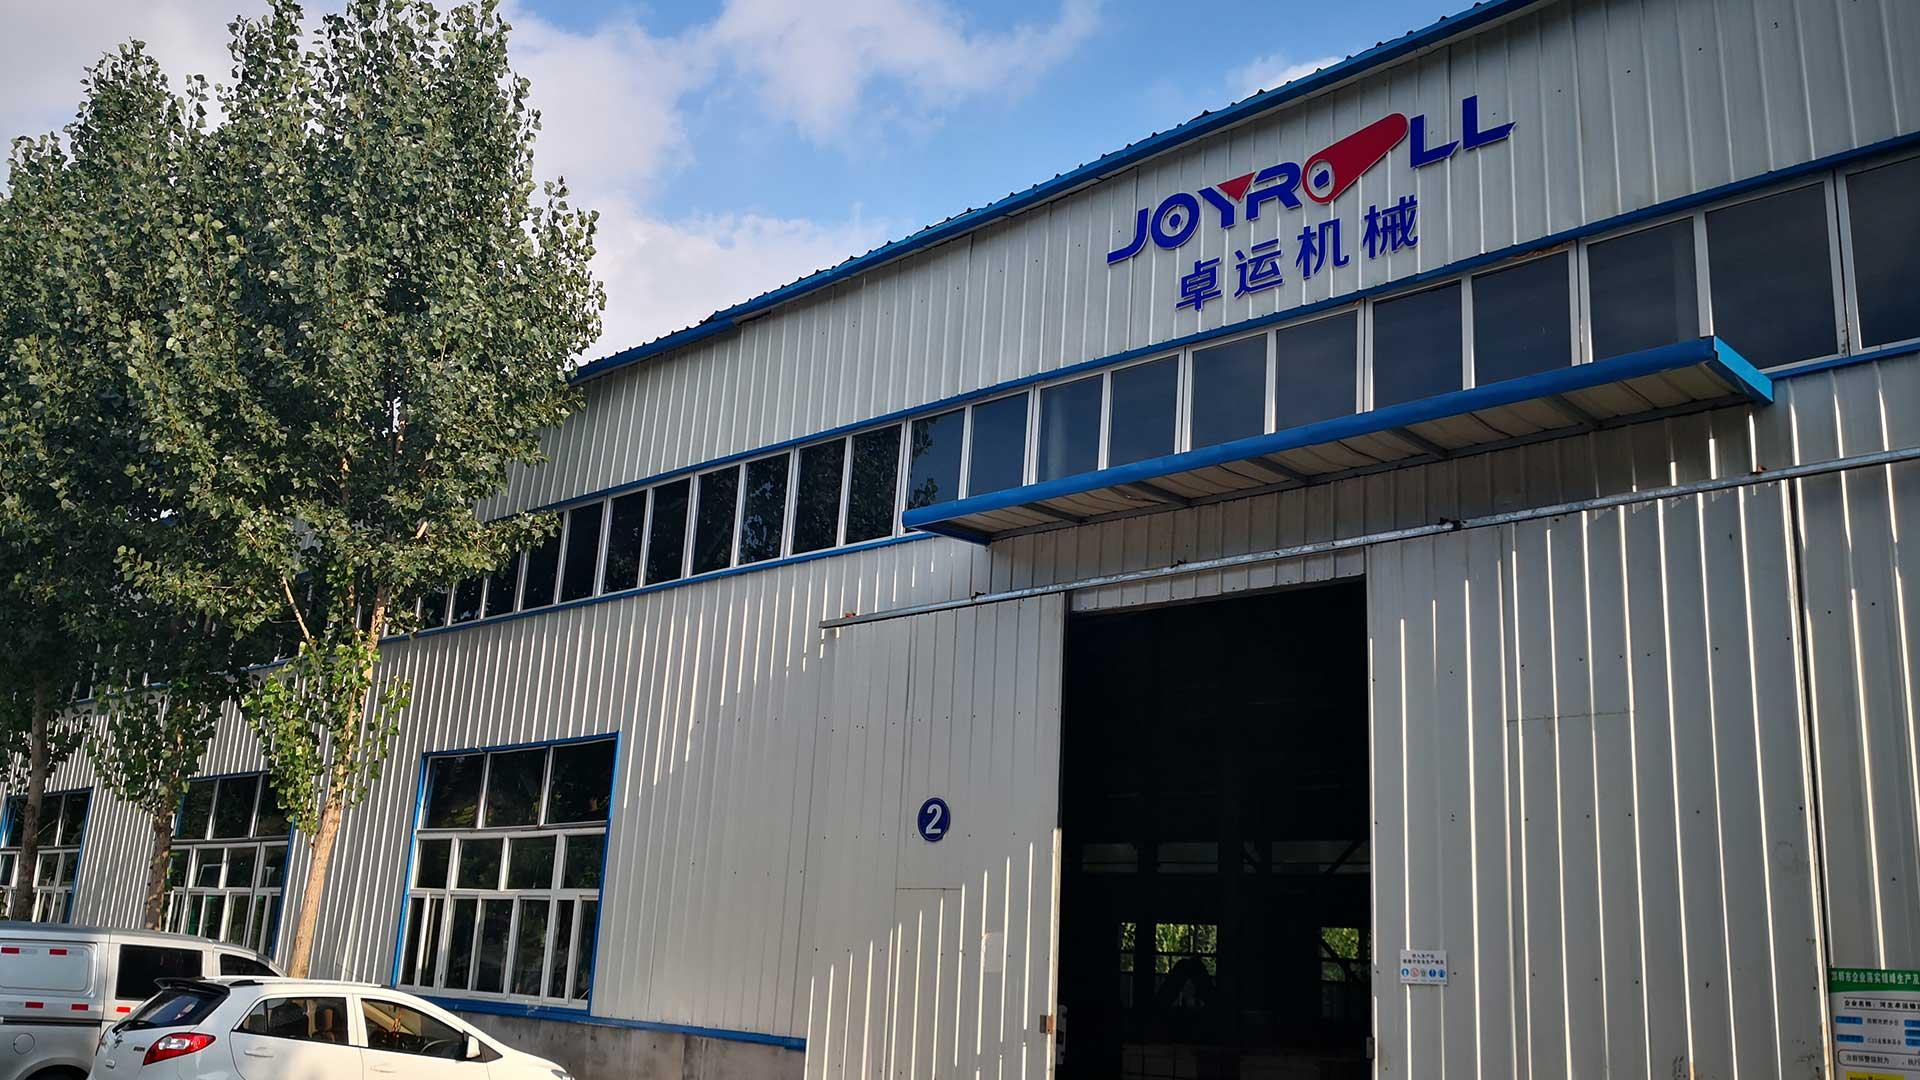 about joyroll